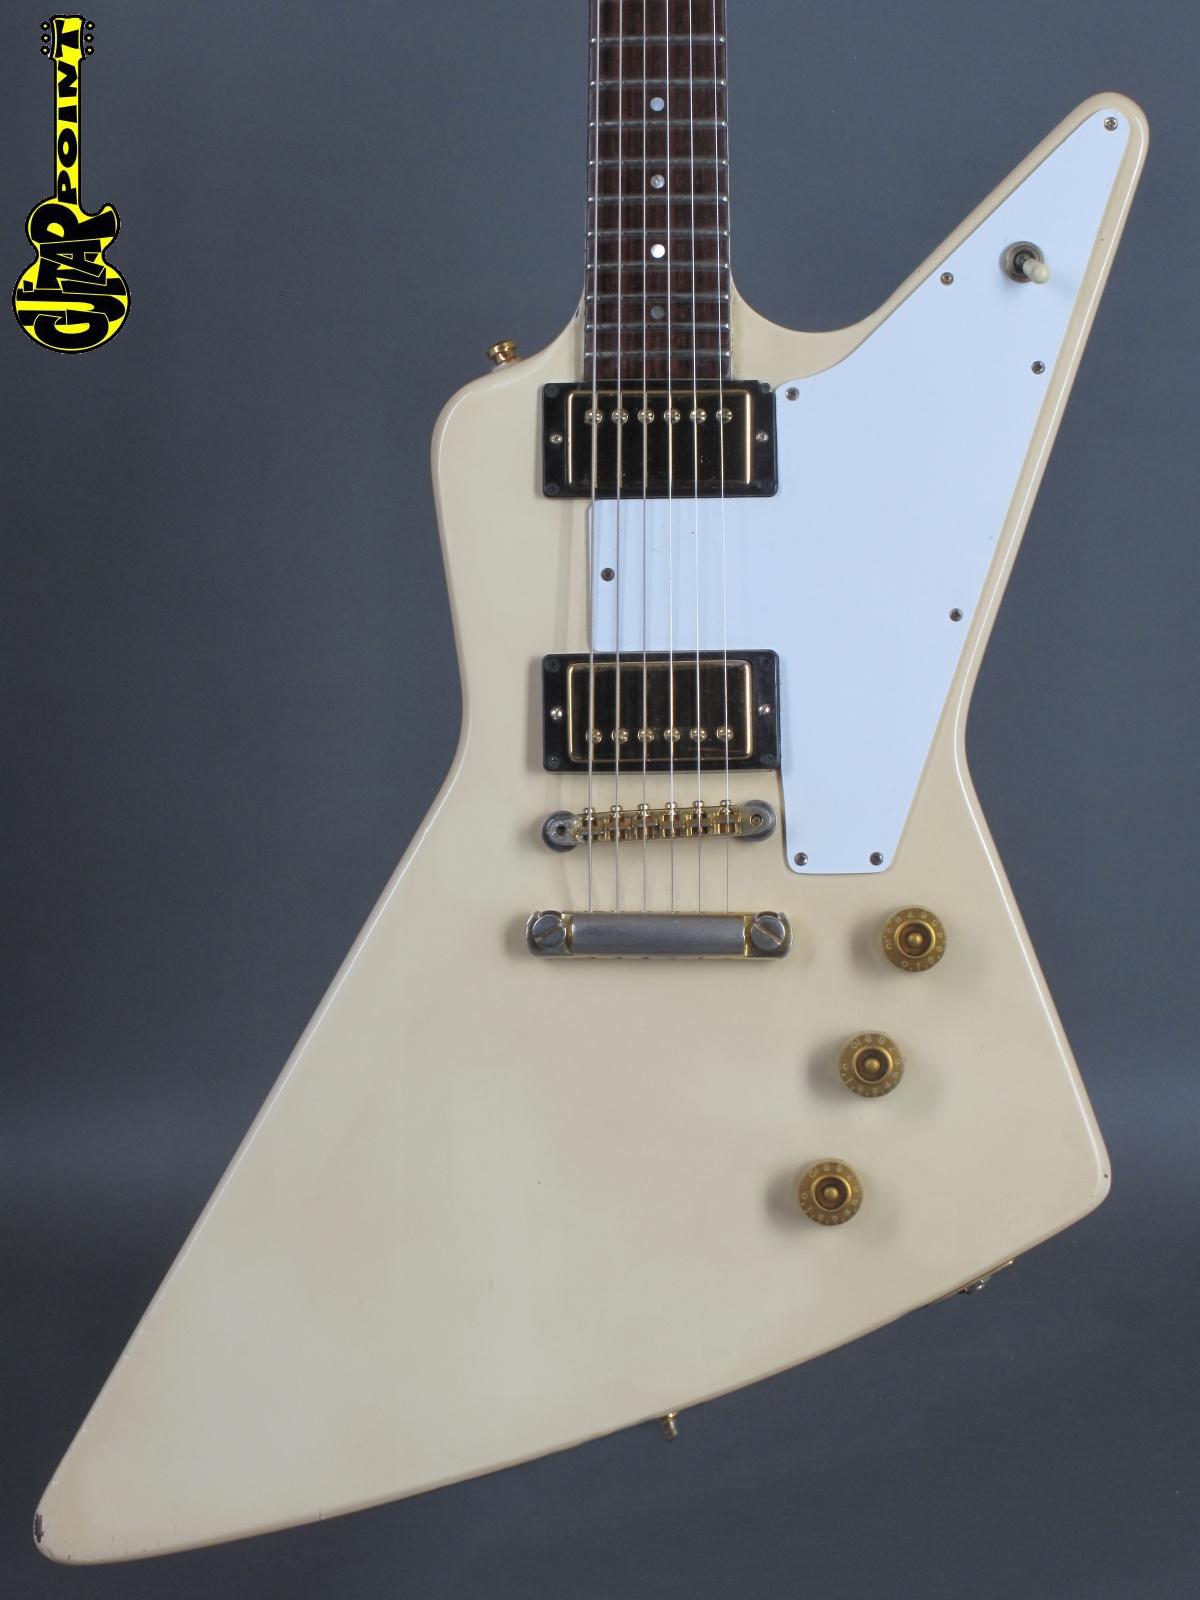 1980 Gibson Explorer (Mahogany) - White